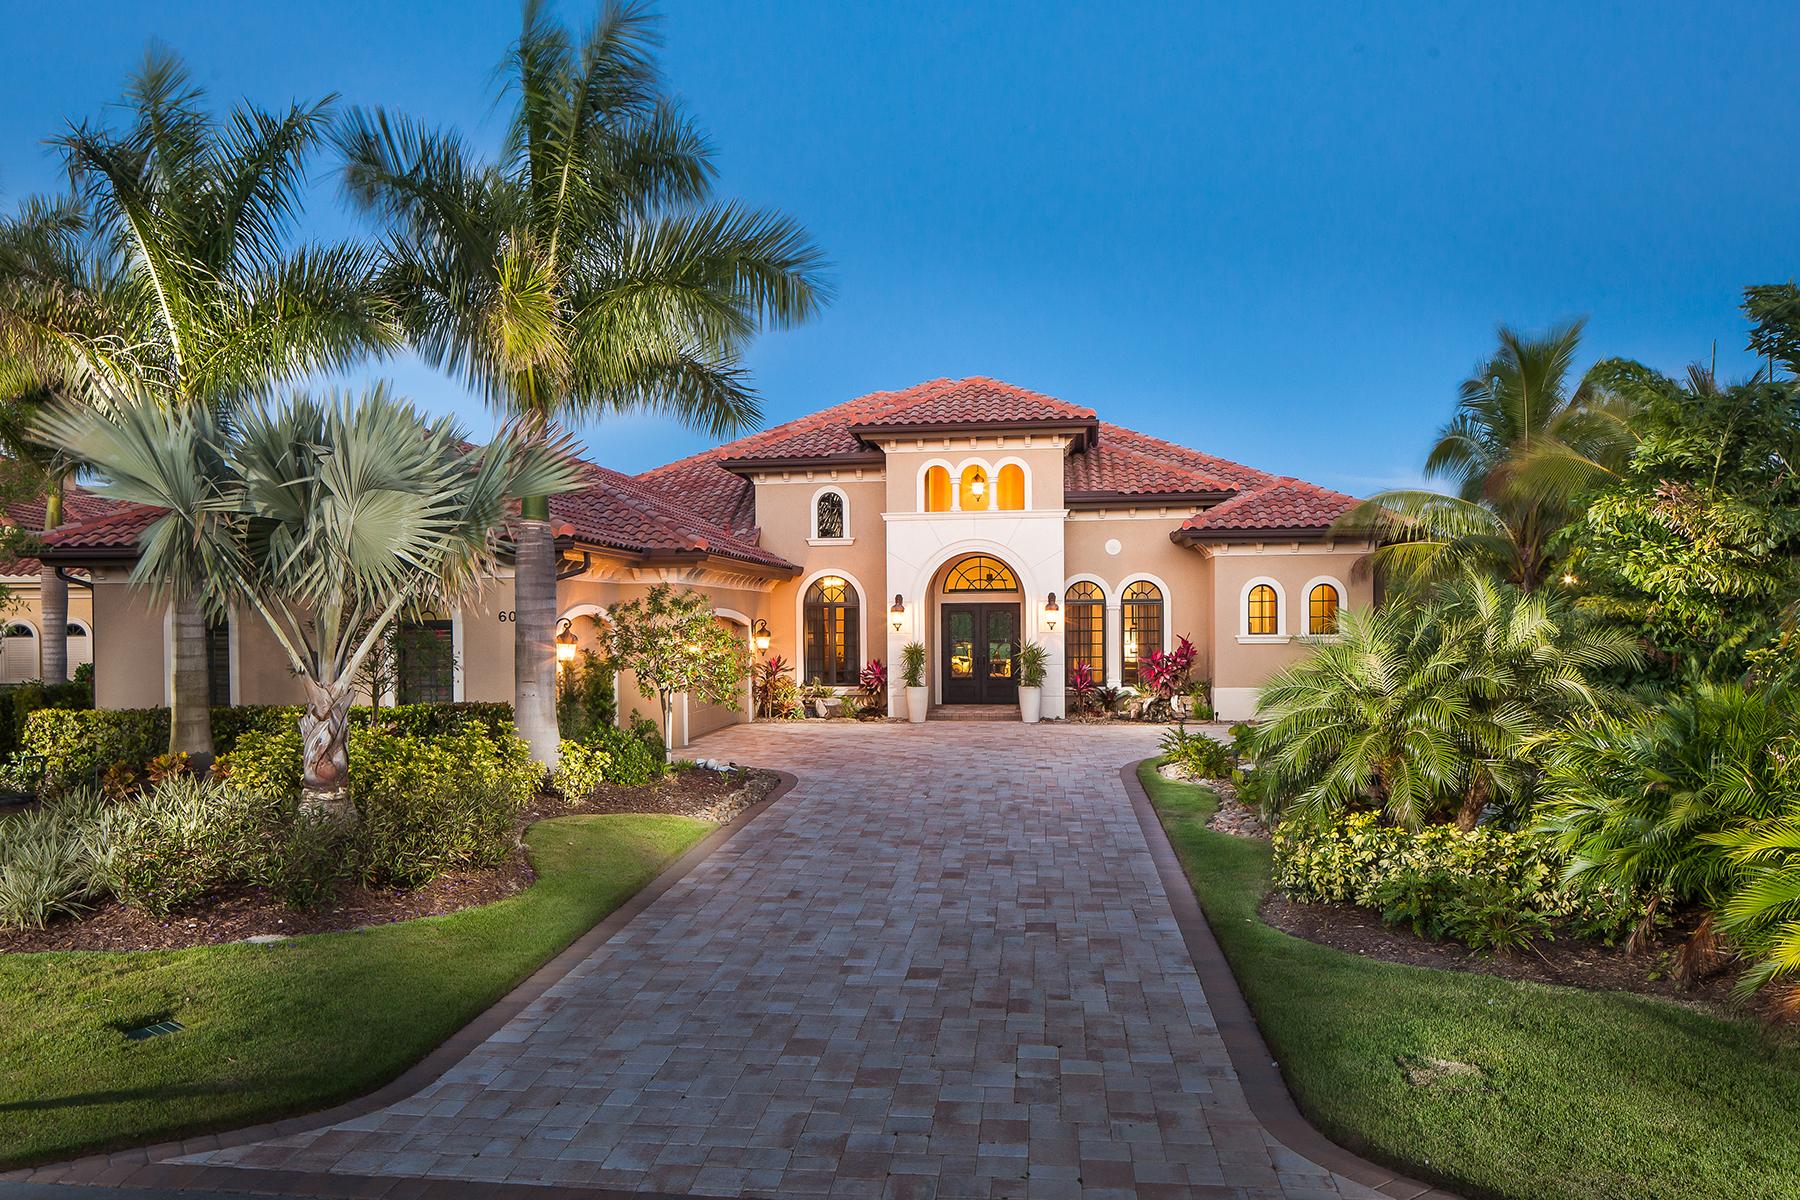 Villa per Vendita alle ore QUAIL WEST 6072 Sunnyslope Dr Naples, Florida, 34119 Stati Uniti